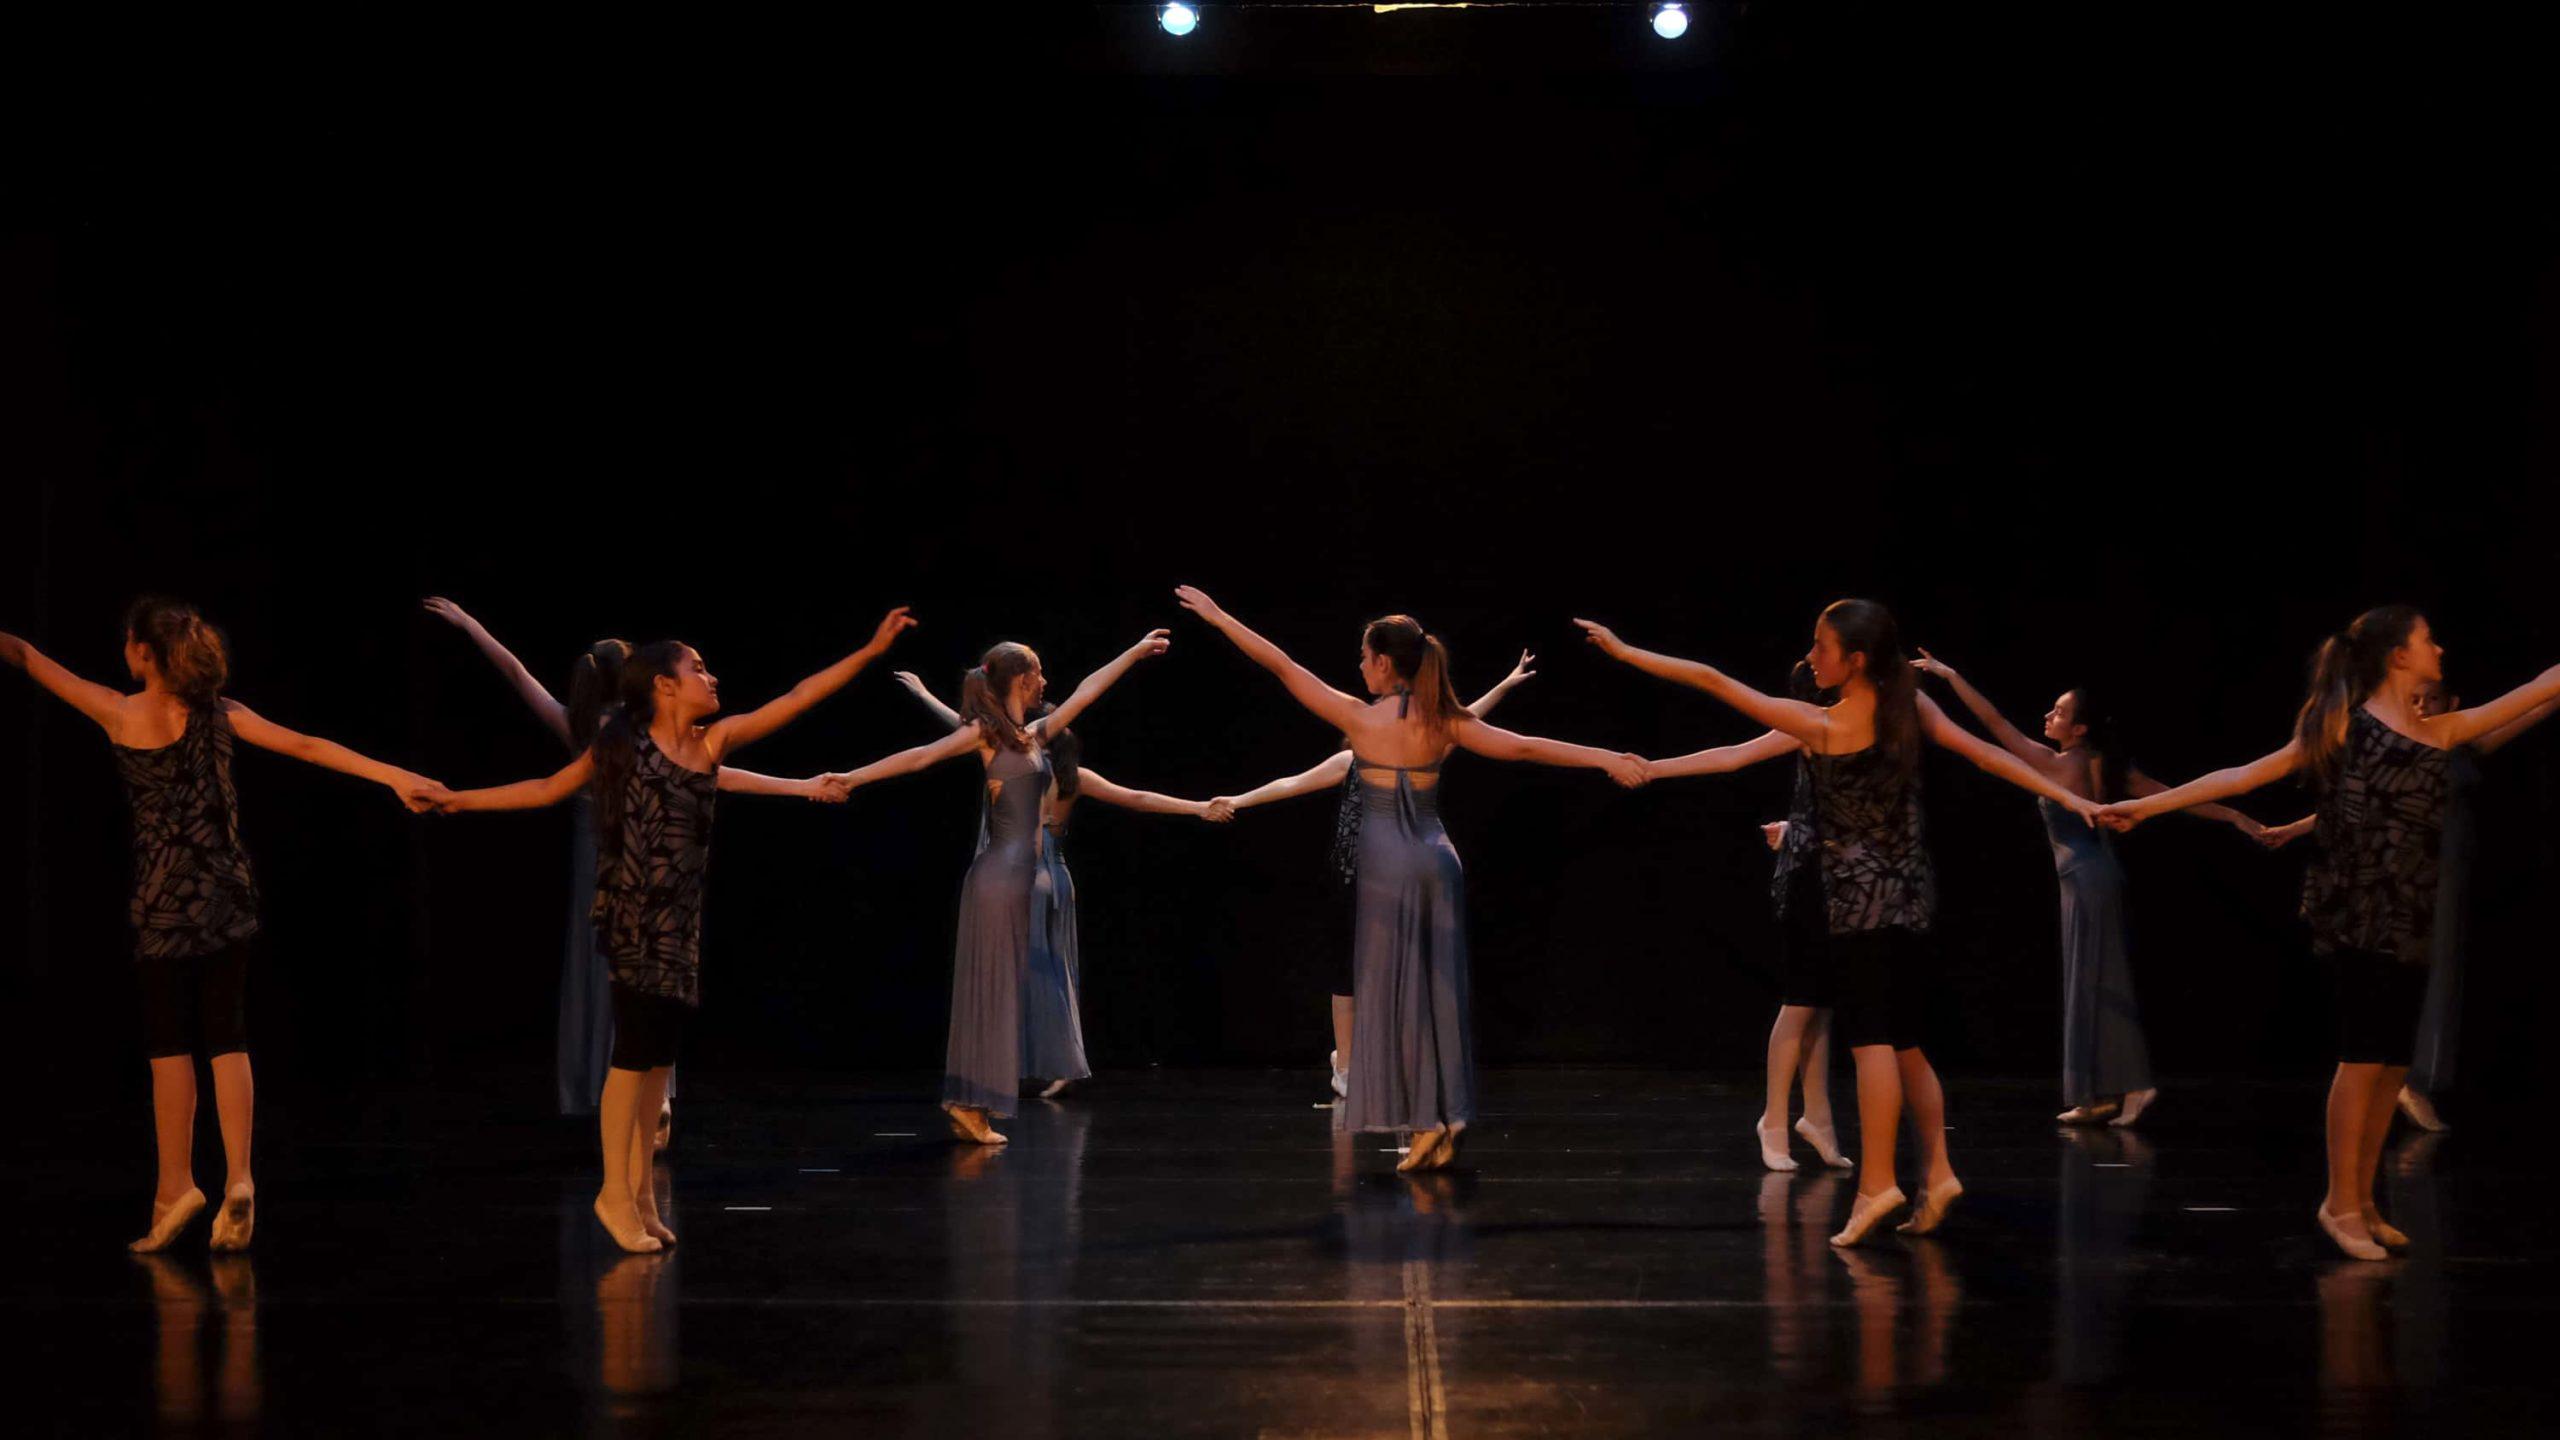 poetar-danzando-13@0.5x